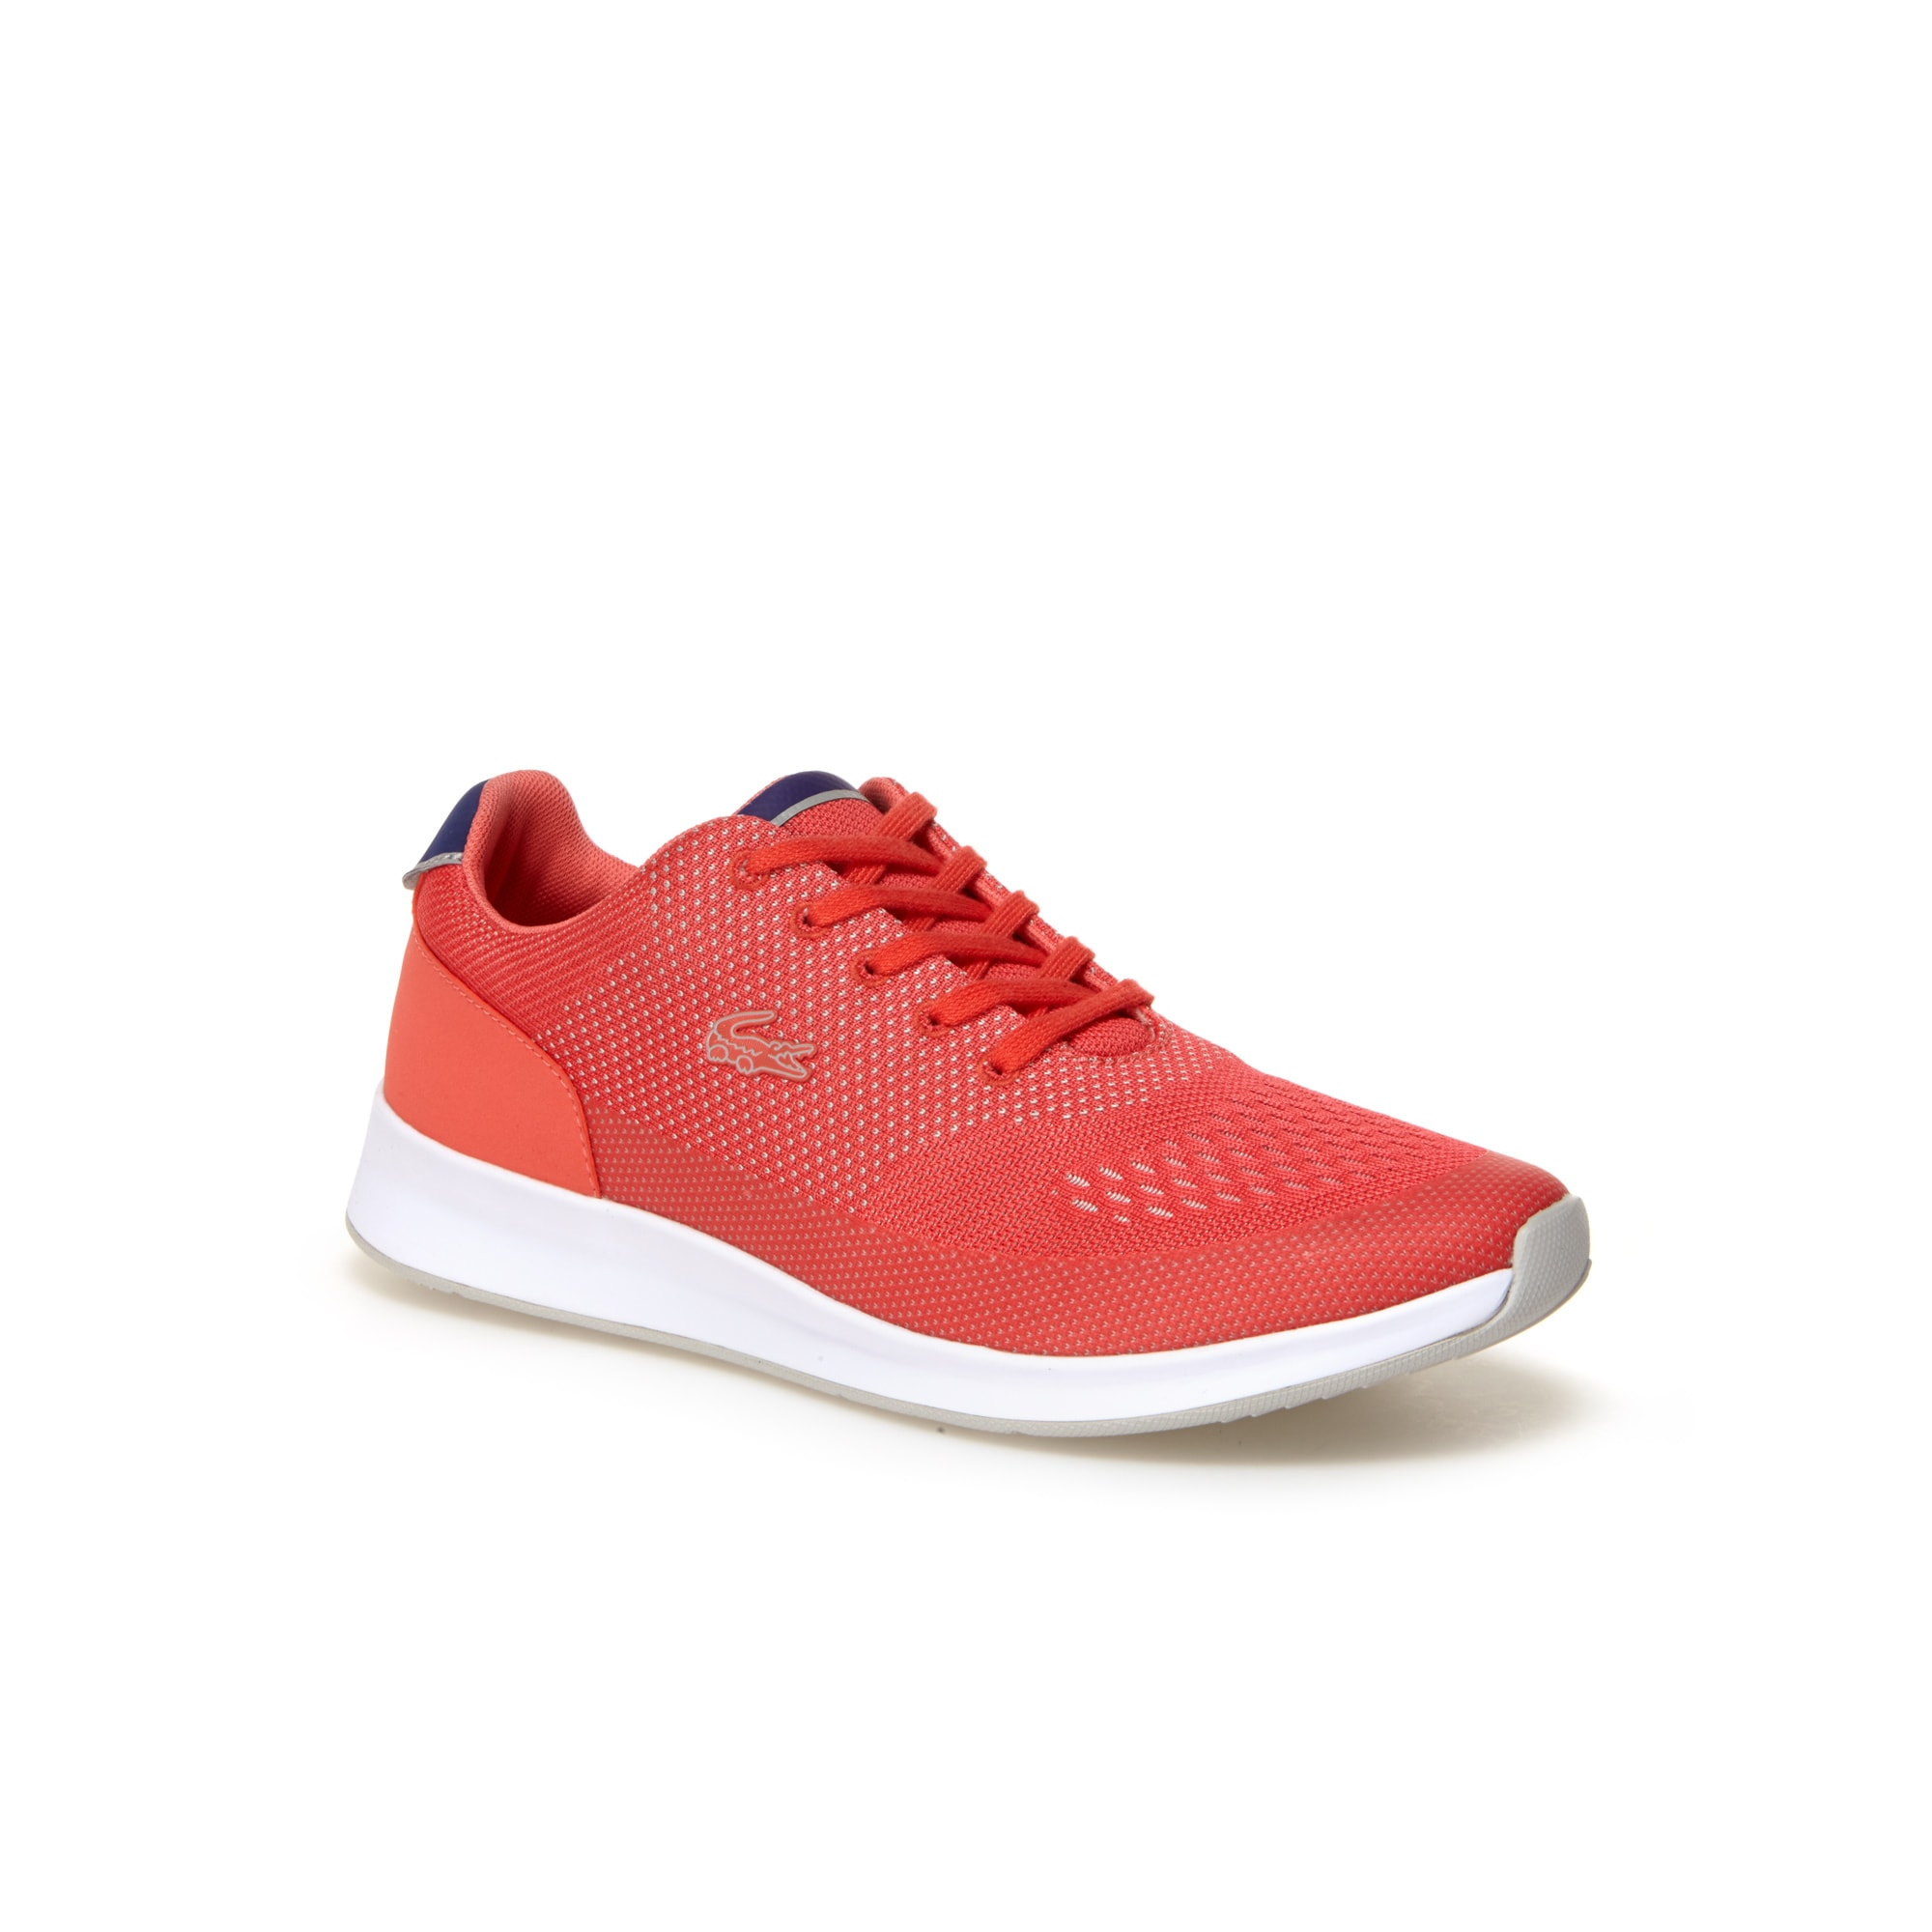 Damen-Sneakers CHAUMONT aus grafisch bedrucktem Stoff